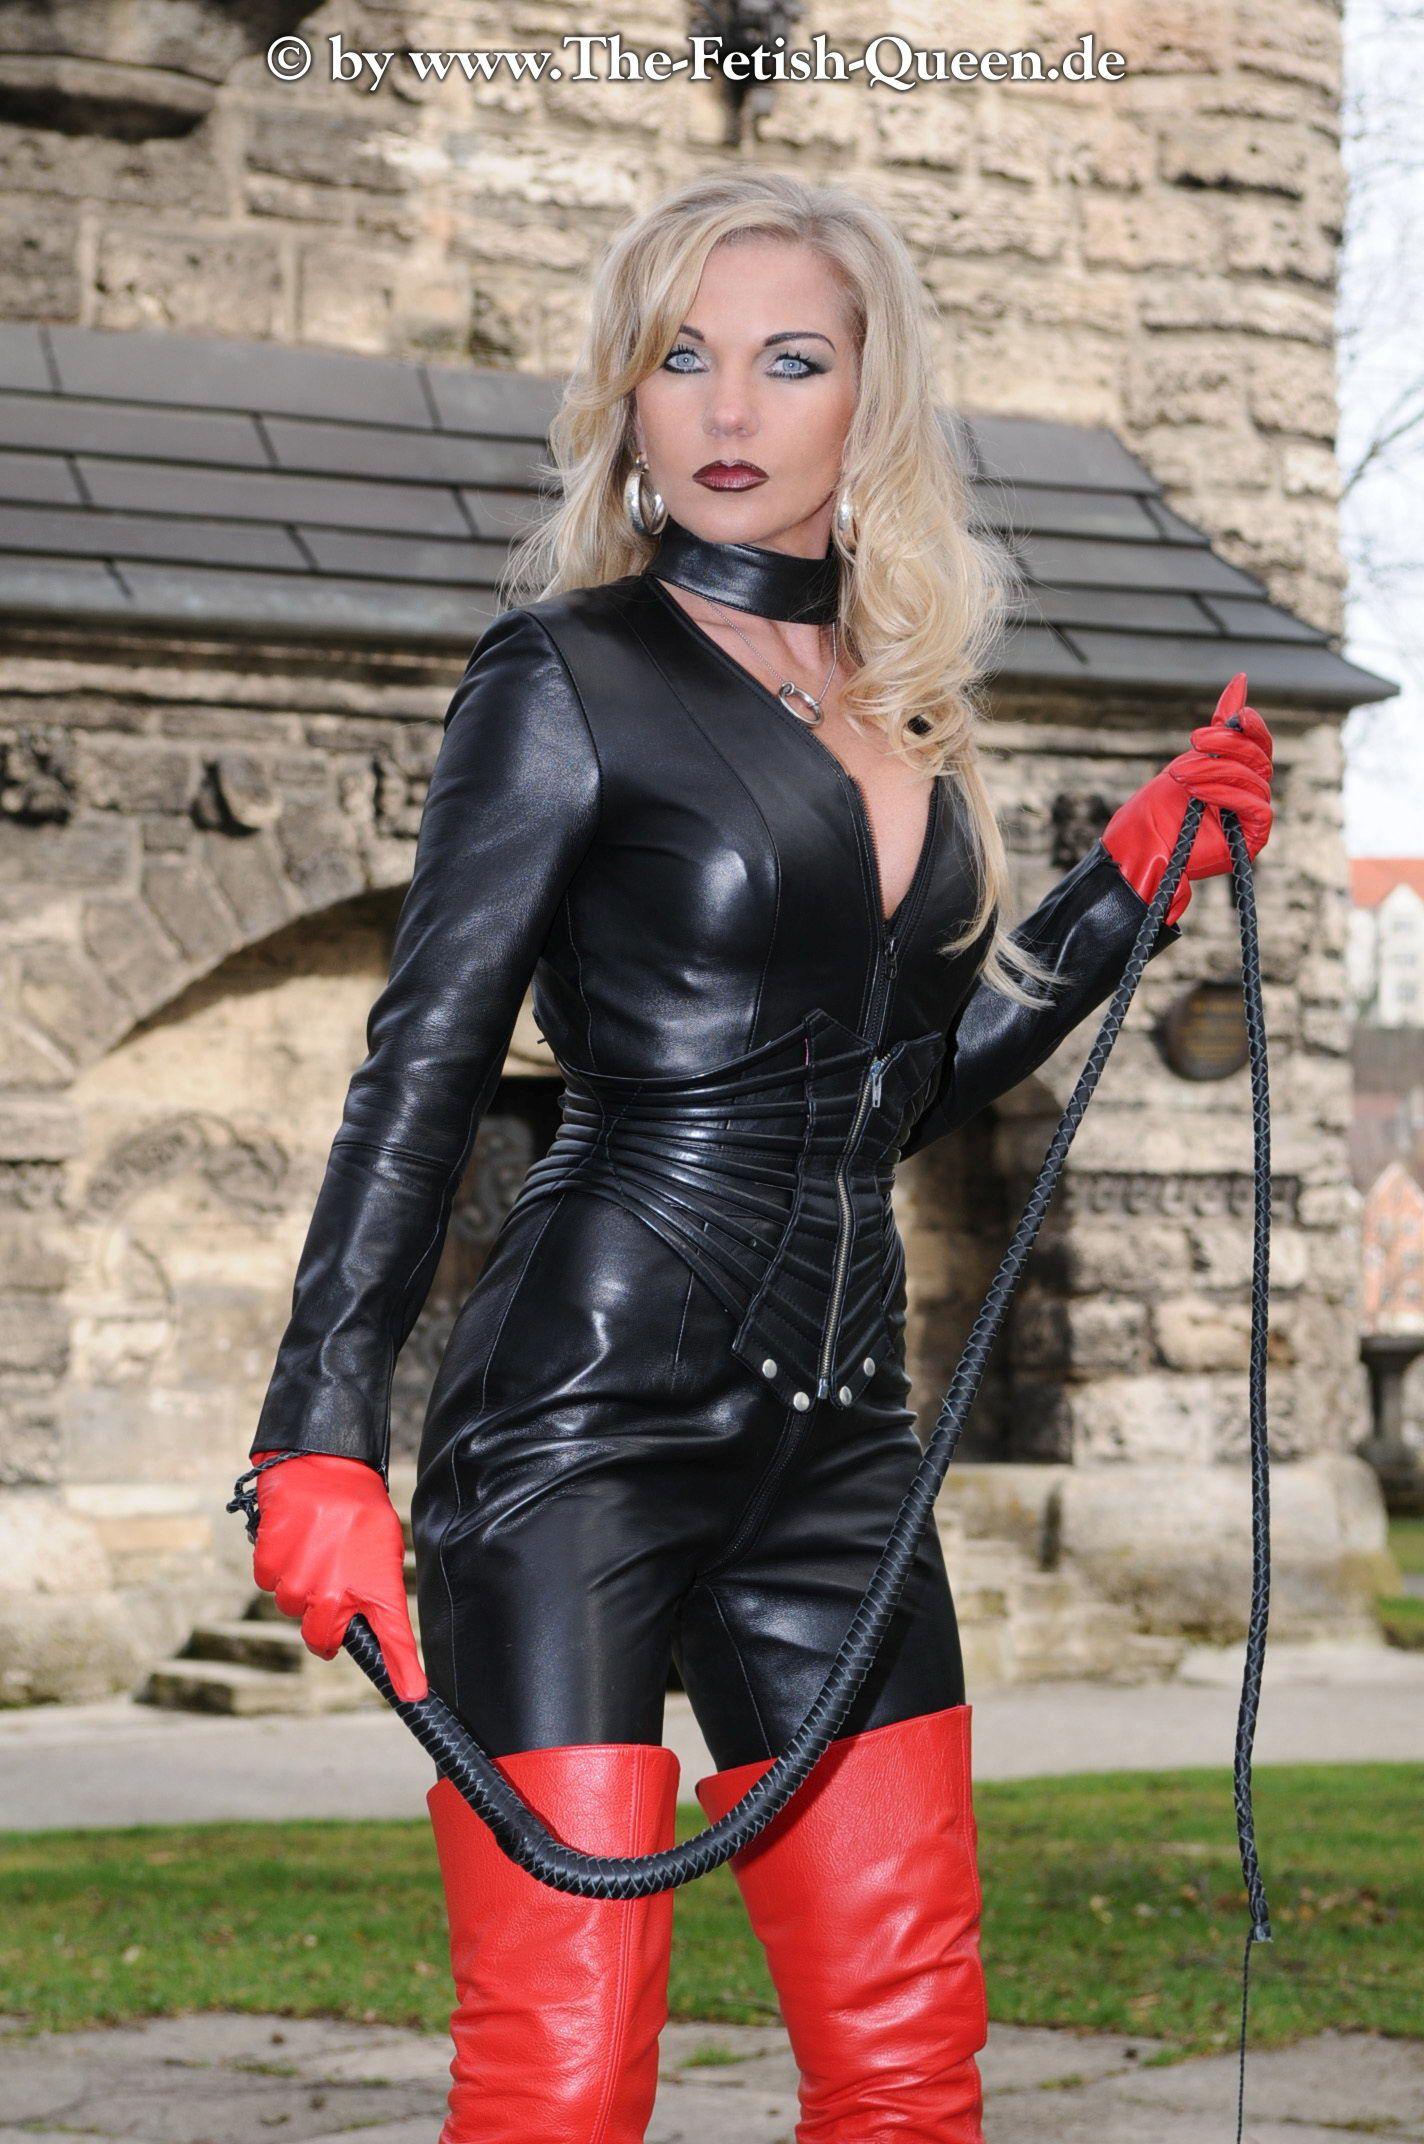 Kinky leather slave fae corbins amateur bdsm and hot wax 9